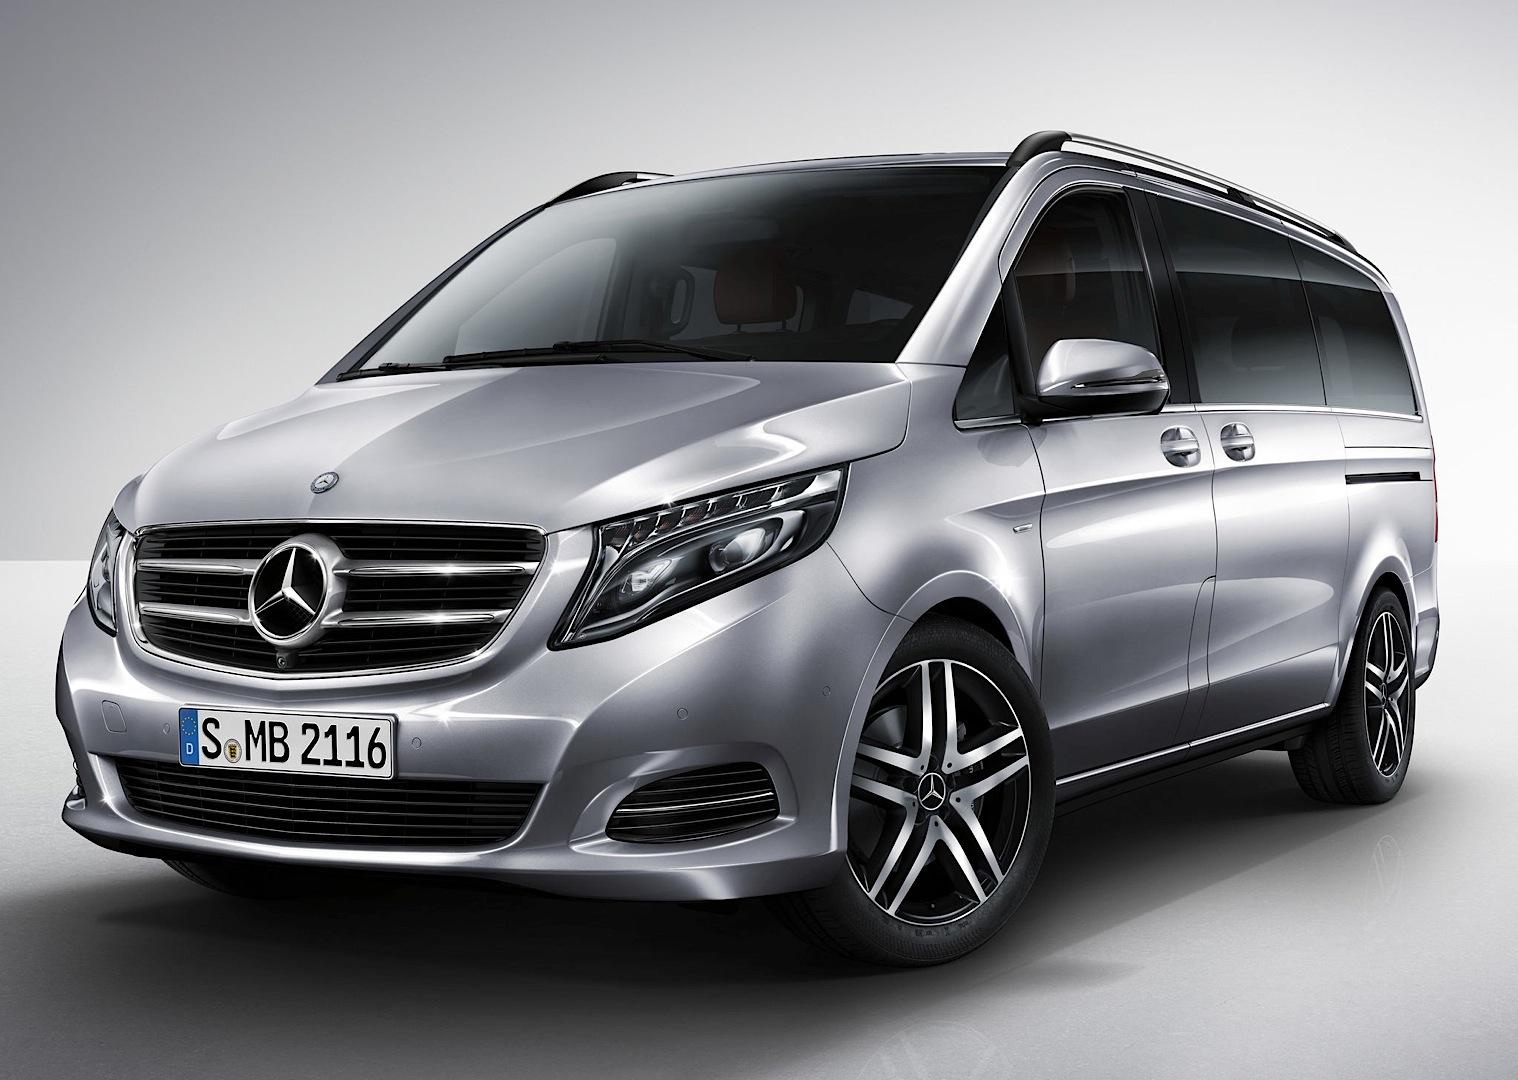 van the auto road benz minivan mercedes on review express vito